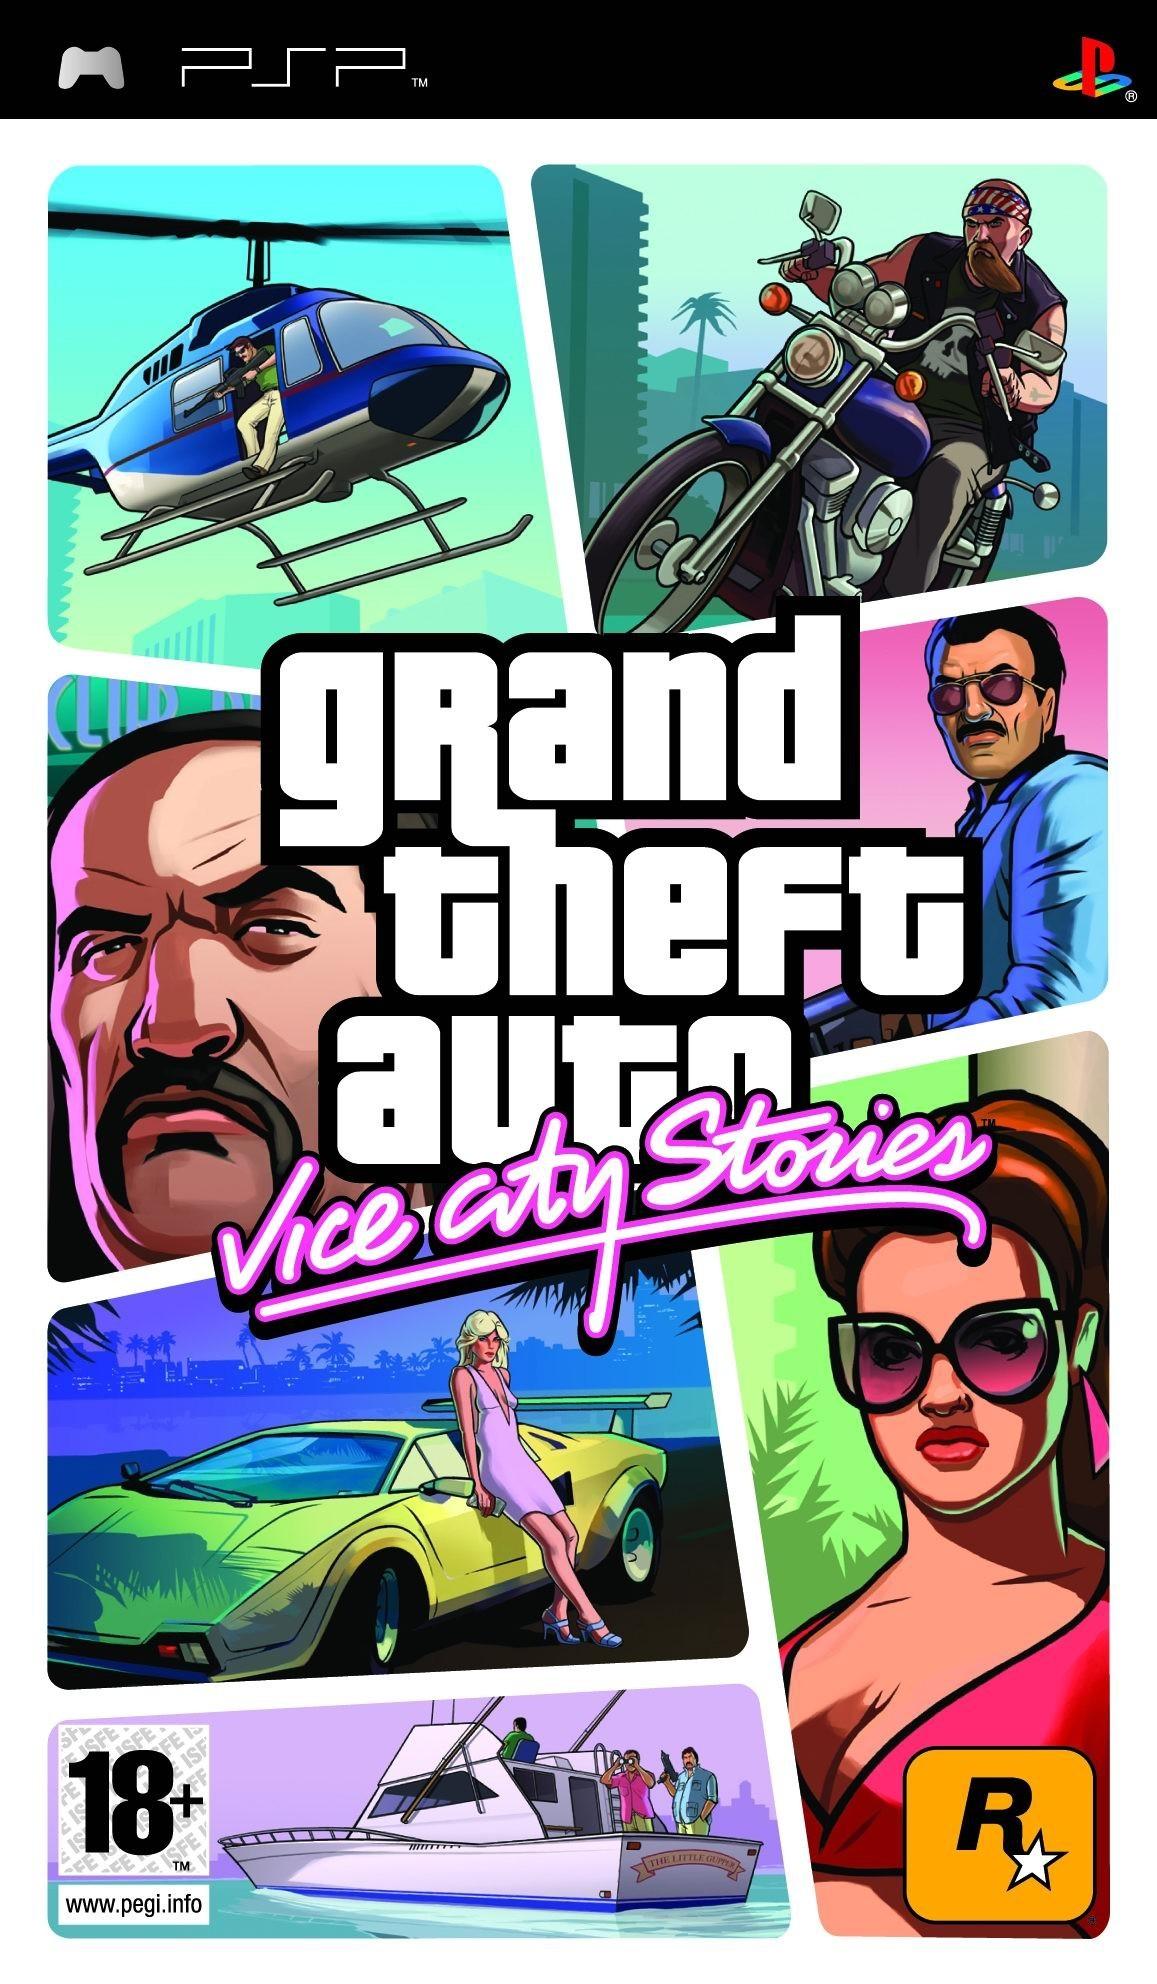 grand theft auto vice: